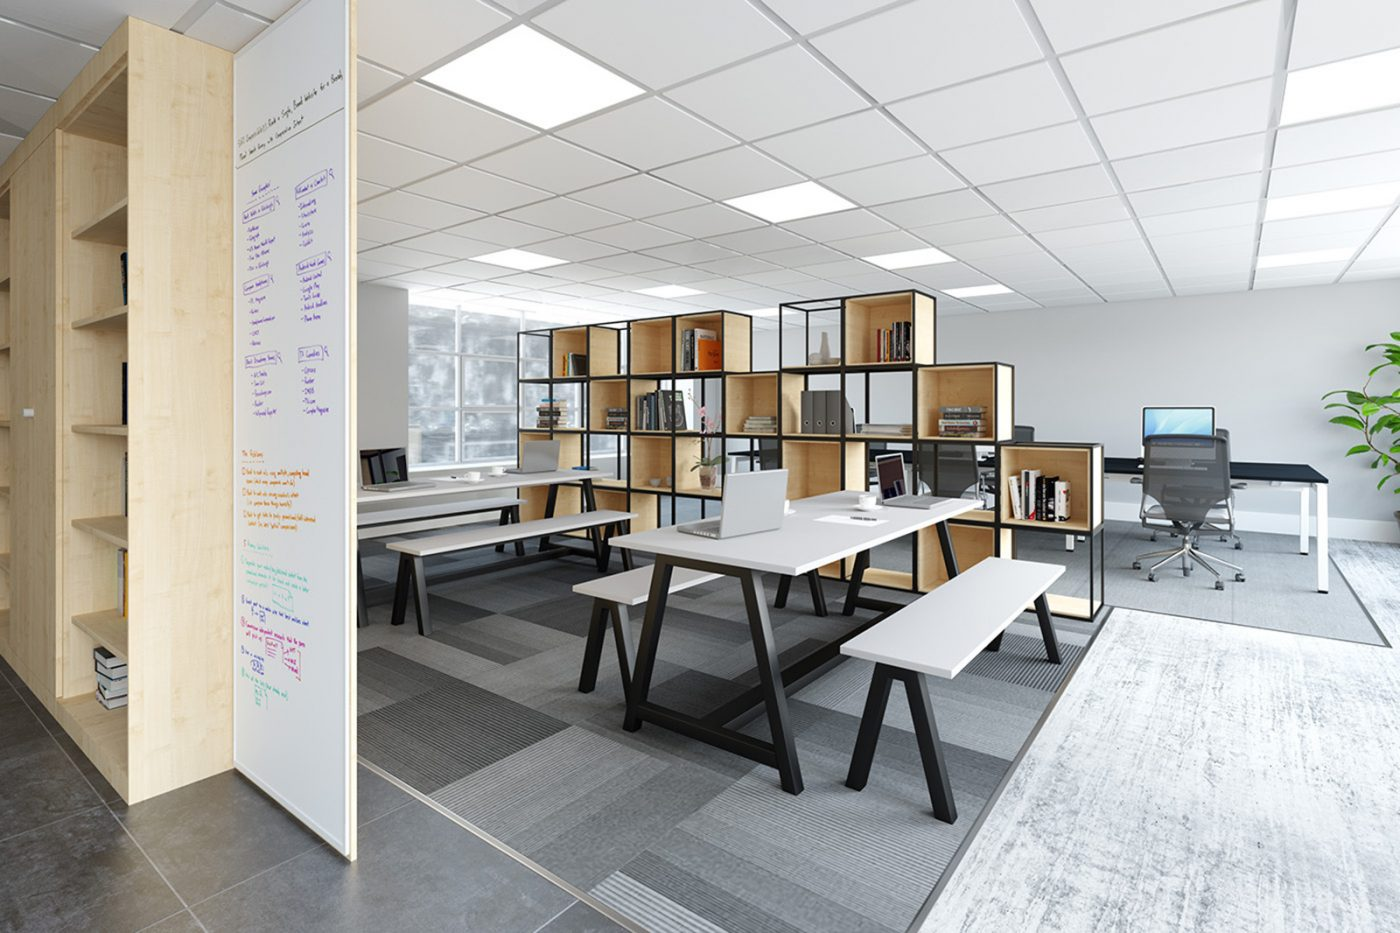 modular storage system, office storage, box storage, grid storage